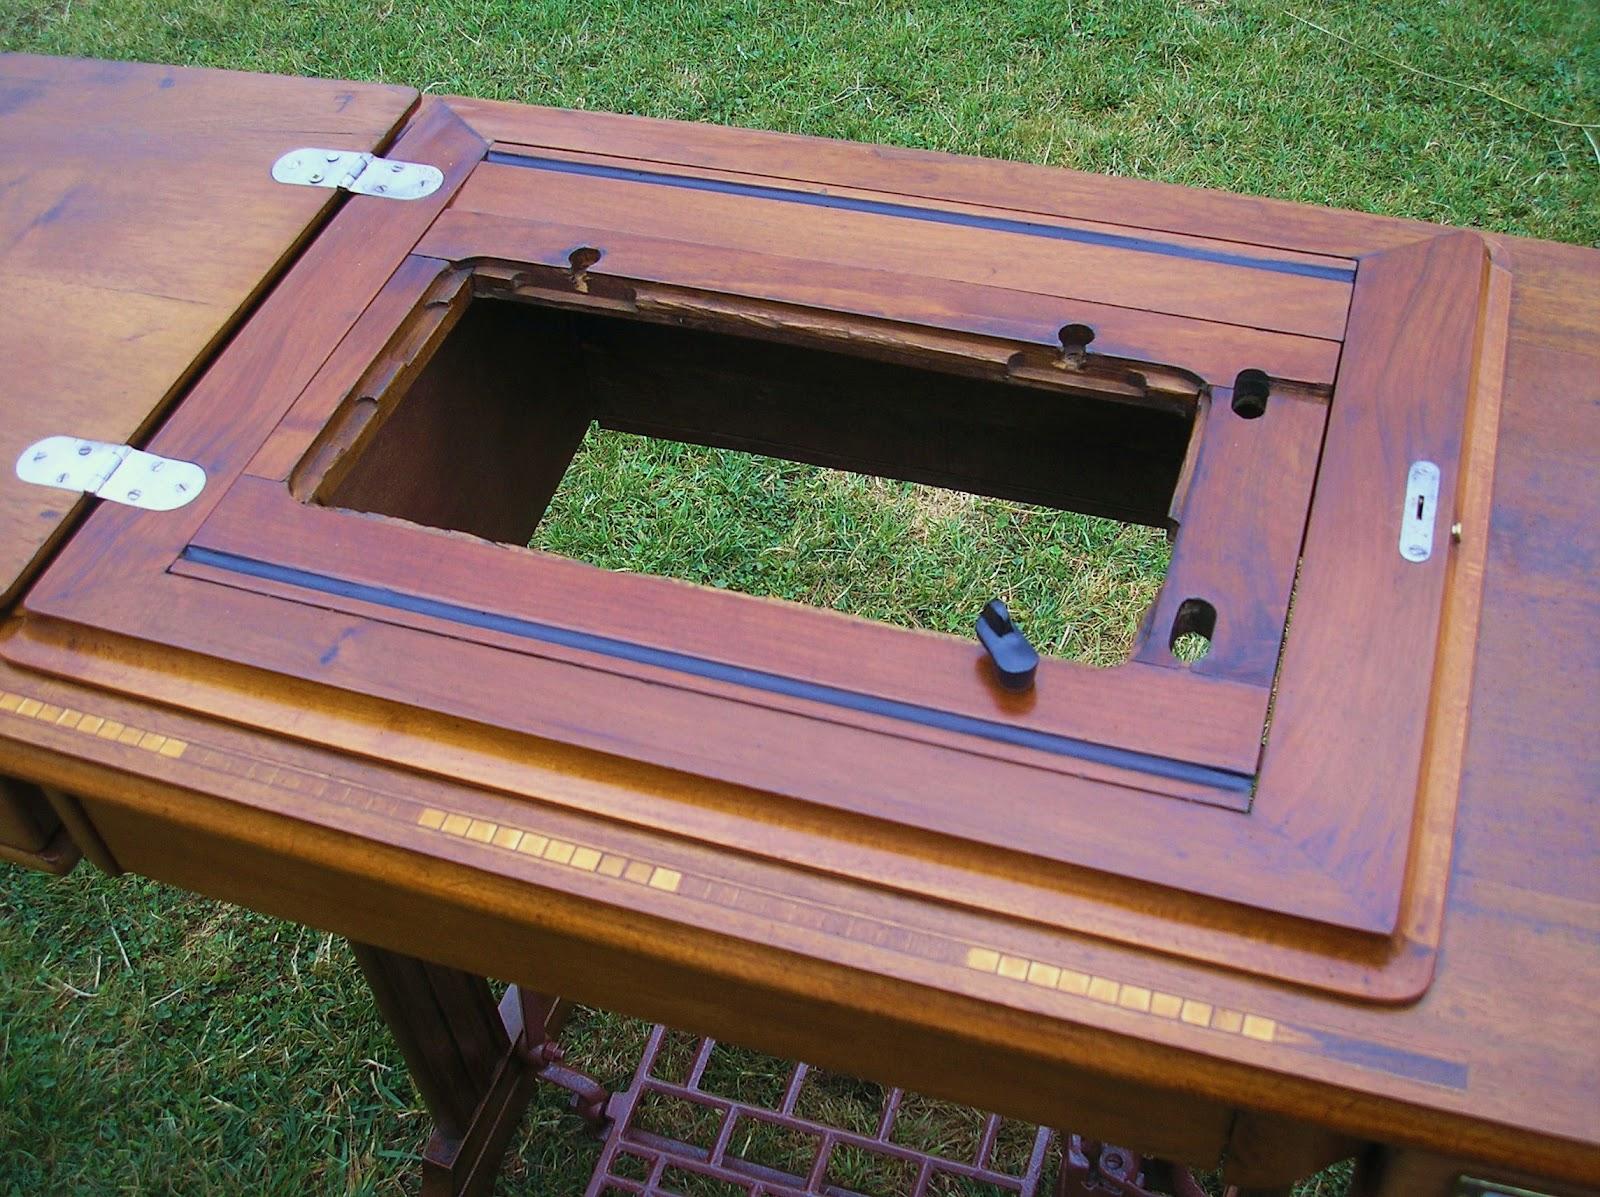 Mueble Maquina Coser Mueble Para Maquina De Coser Mimasku Com # Muebles Maquina De Coser Segunda Mano